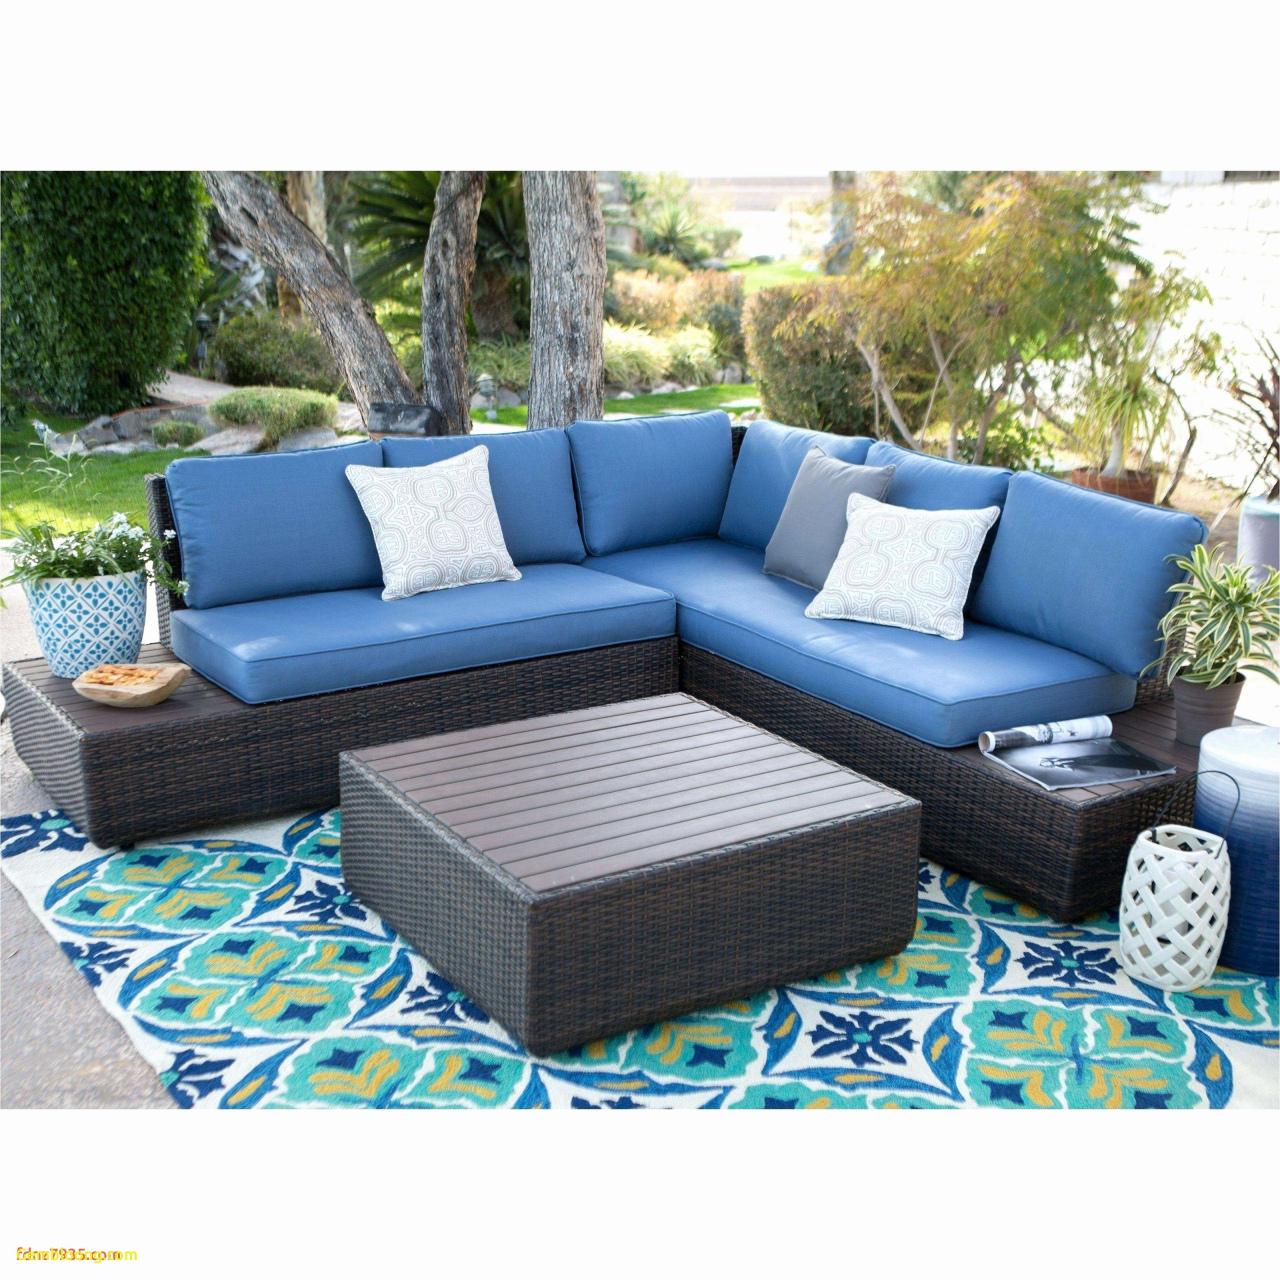 patio daybed 30 elegant costco outdoor patio furniture ideas durch patio daybed